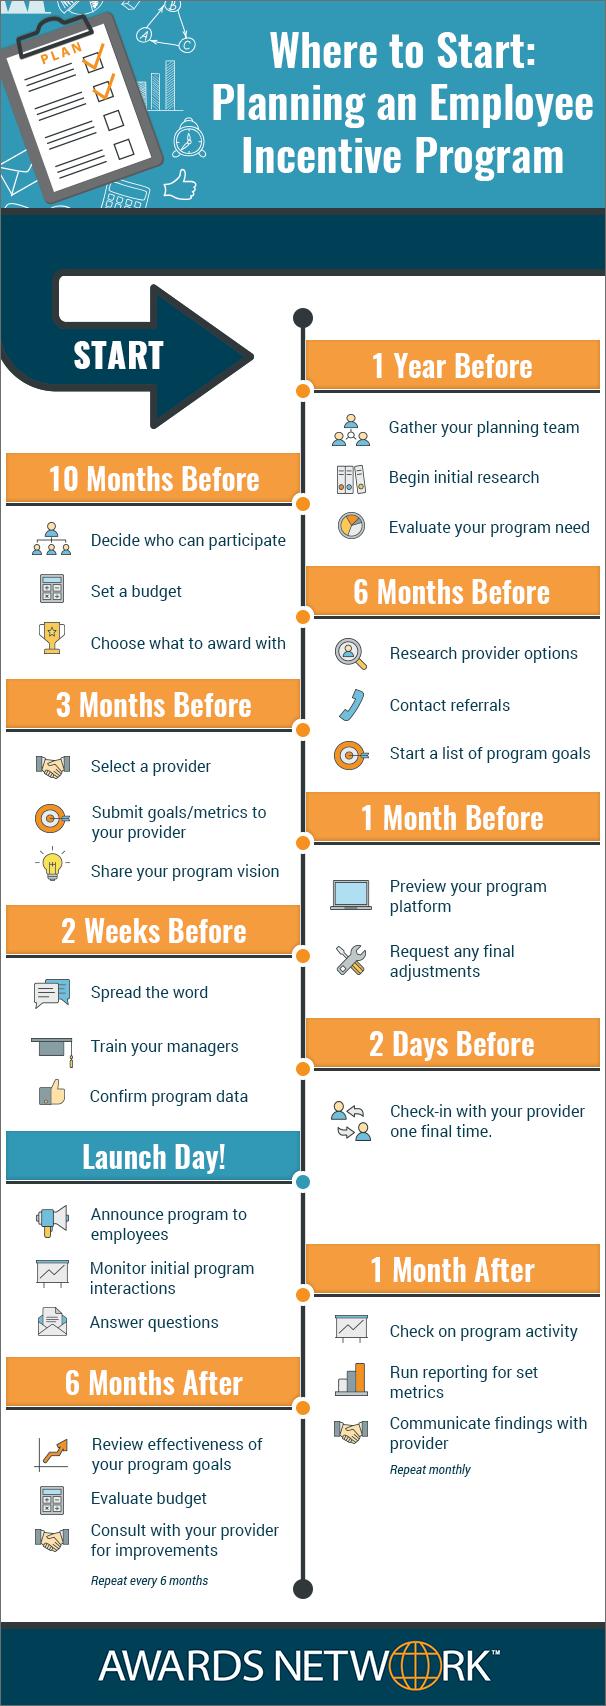 Planning an Employee Incentive Program Timeline